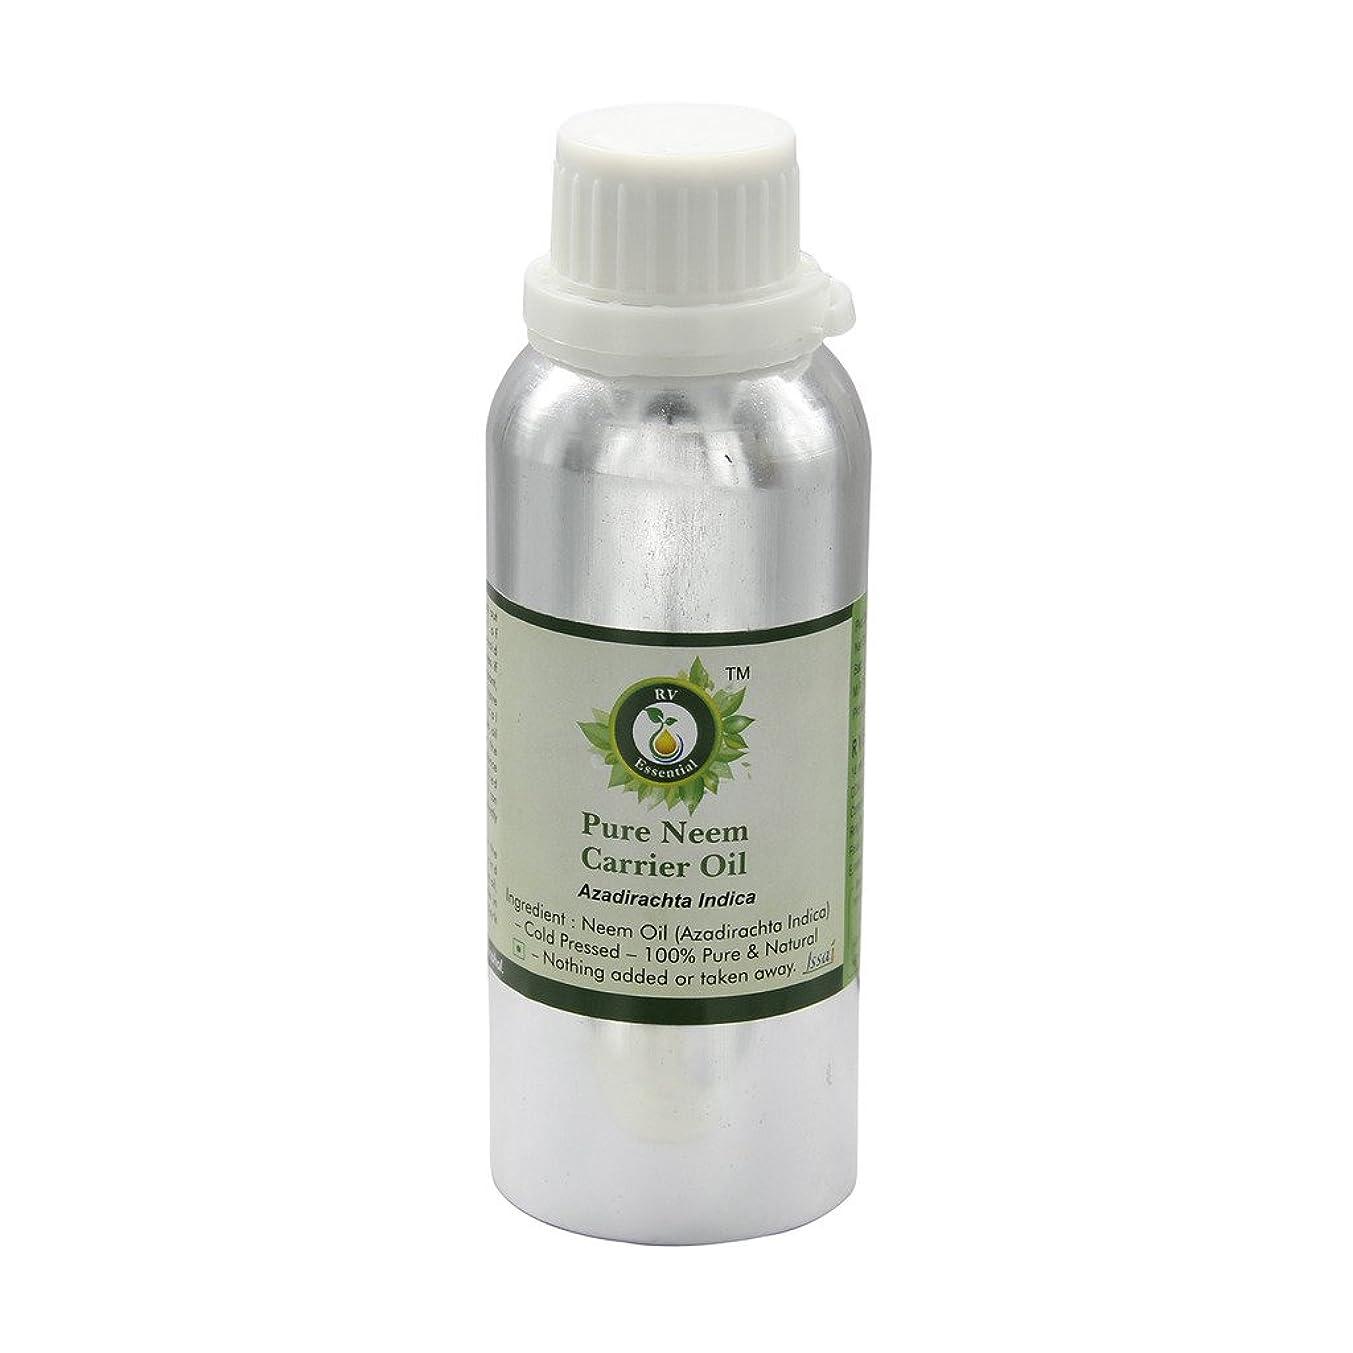 R V Essential 純Neemキャリアオイル300ml (10oz)- Azadirachta Indica (100%ピュア&ナチュラルコールドPressed) Pure Neem Carrier Oil